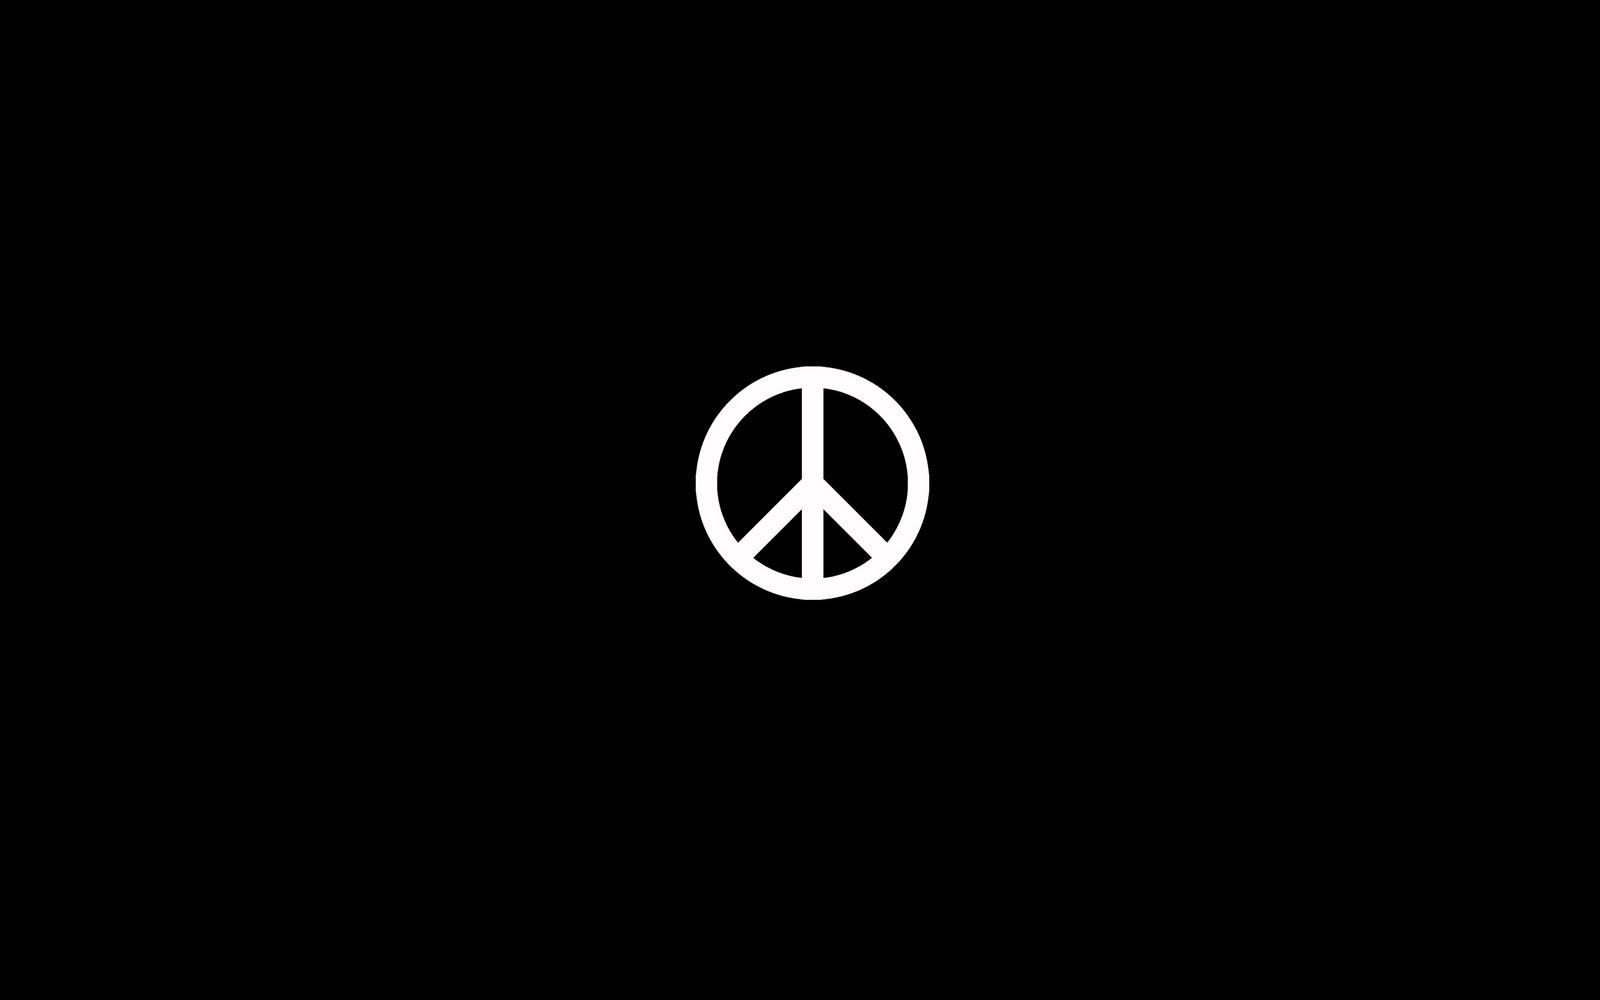 http://3.bp.blogspot.com/-WmCHRoQ983Y/Tm0SbseA6aI/AAAAAAAAINI/_R0I7zml5SM/s1600/peace_symbol_wallpaper_by_padguy-d36wwoc.jpg